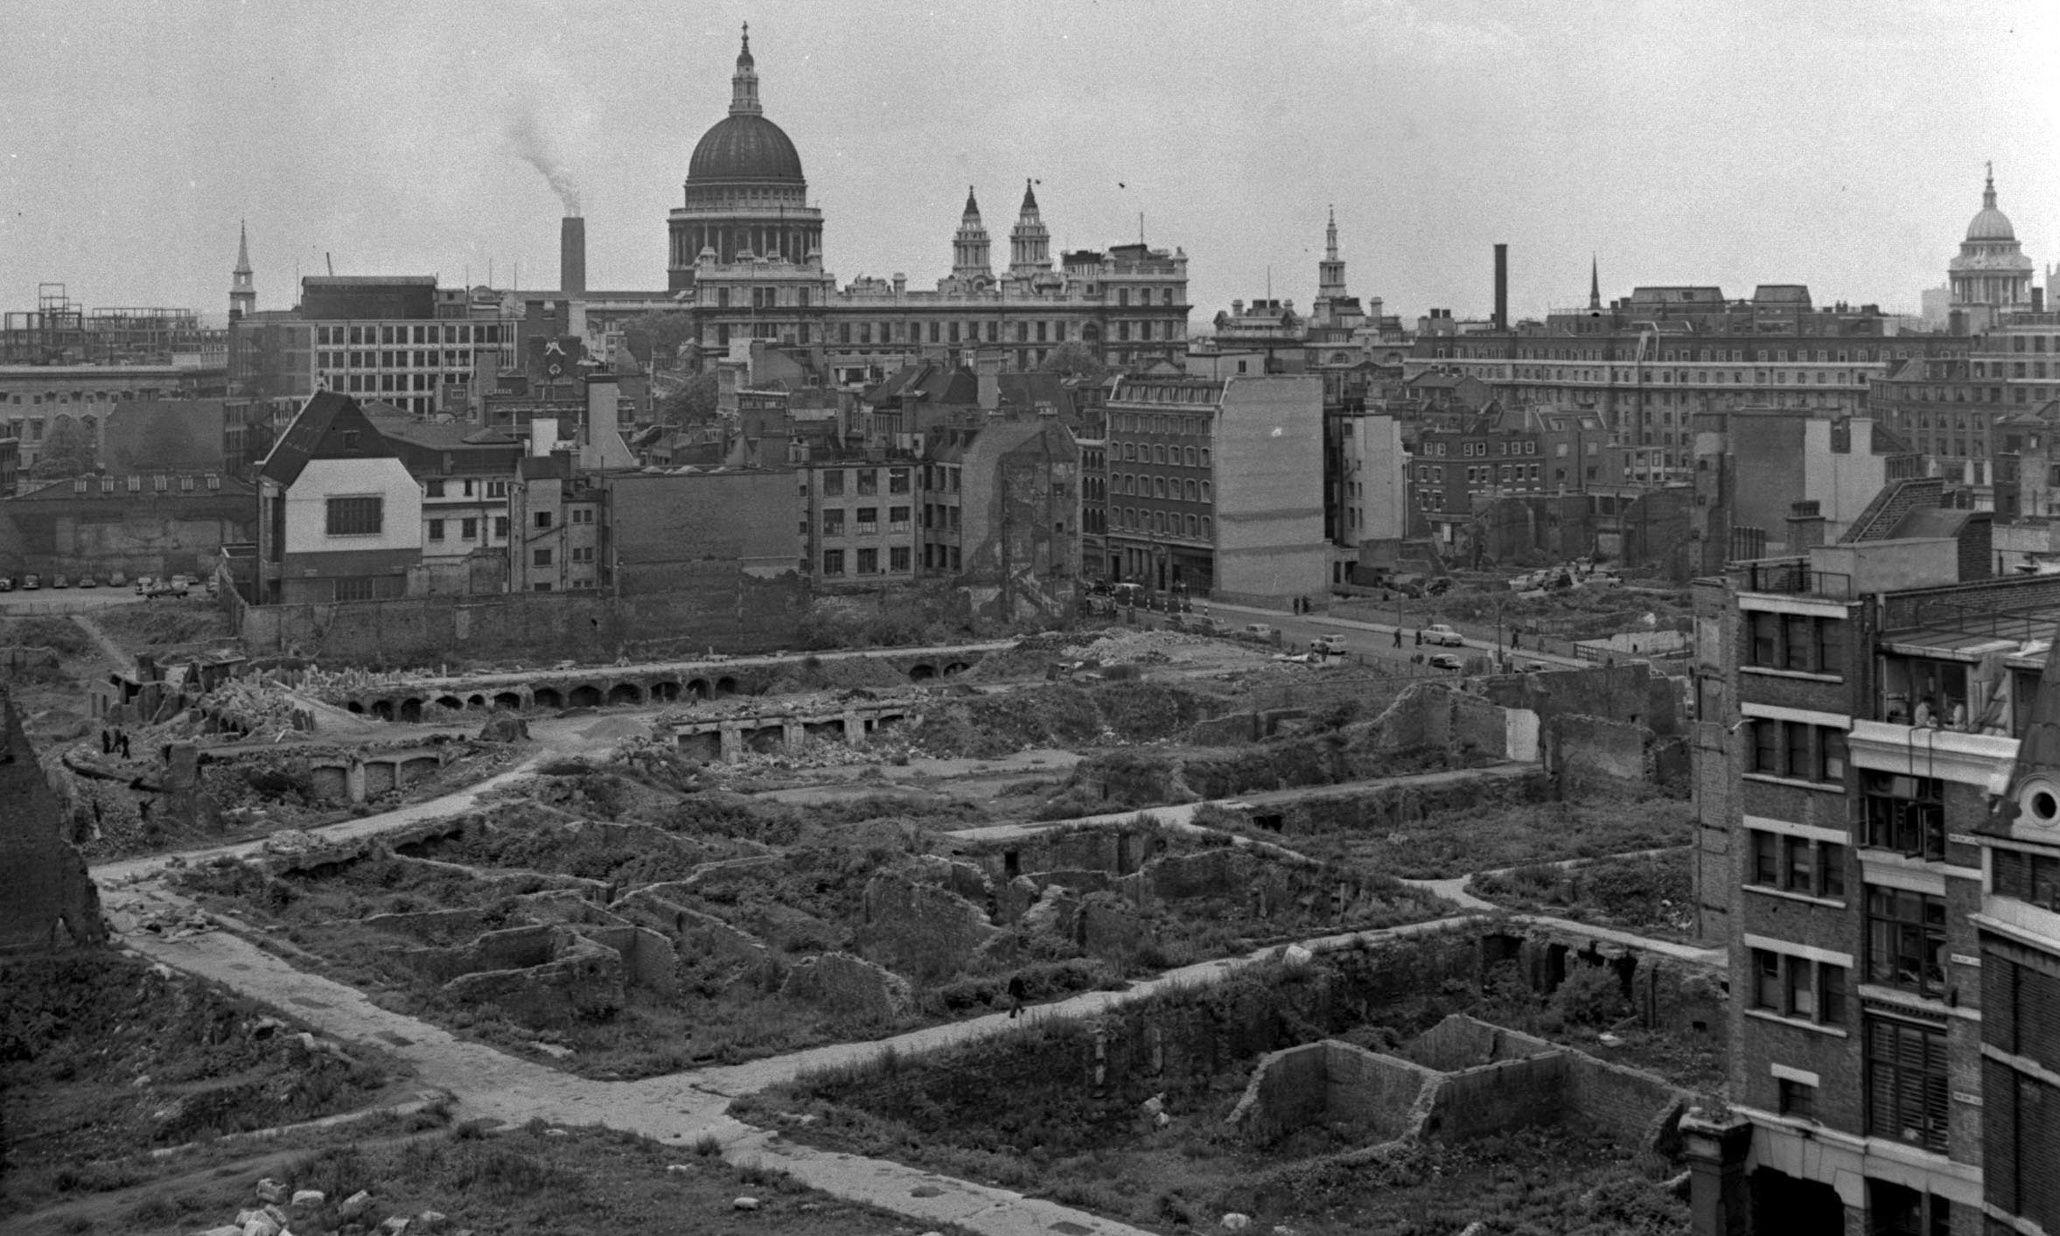 From Cripplegate to Agar Town: inside London's vanished neighbourhoods